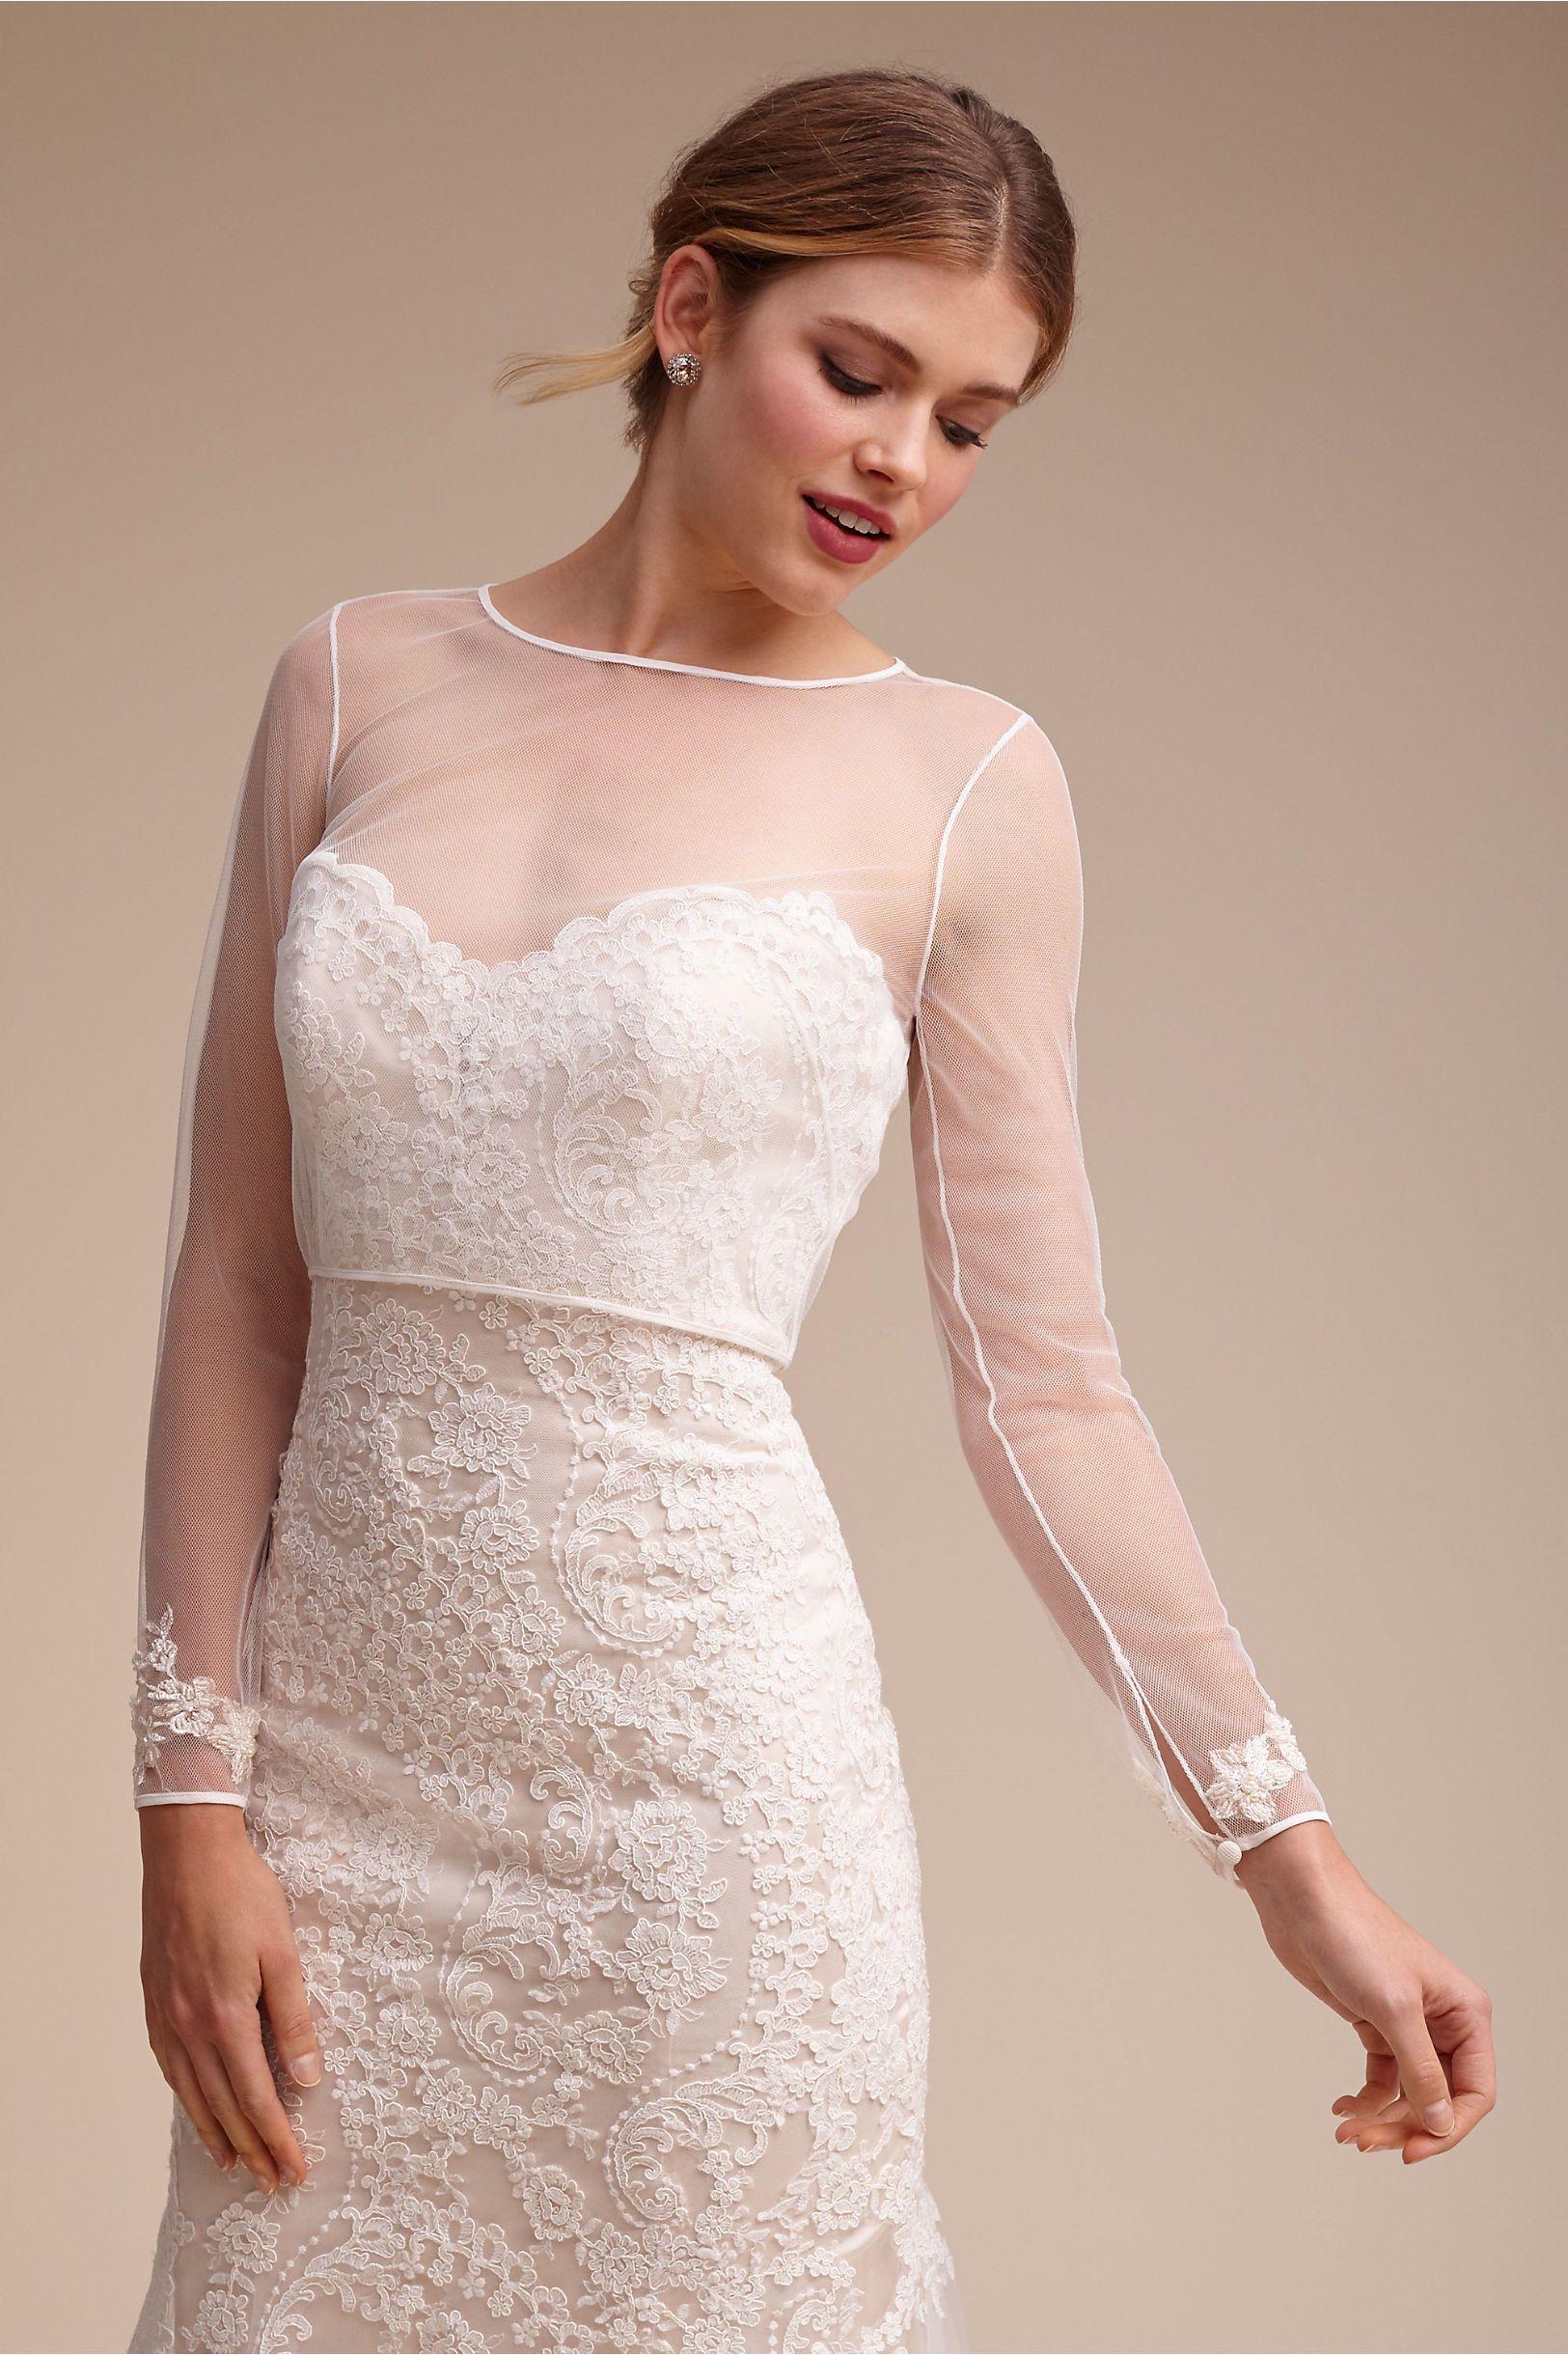 Leigh Gown Ivory Cream In Bride Bhldn Dress Topper Wedding Dress Topper Wedding Dress Long Sleeve